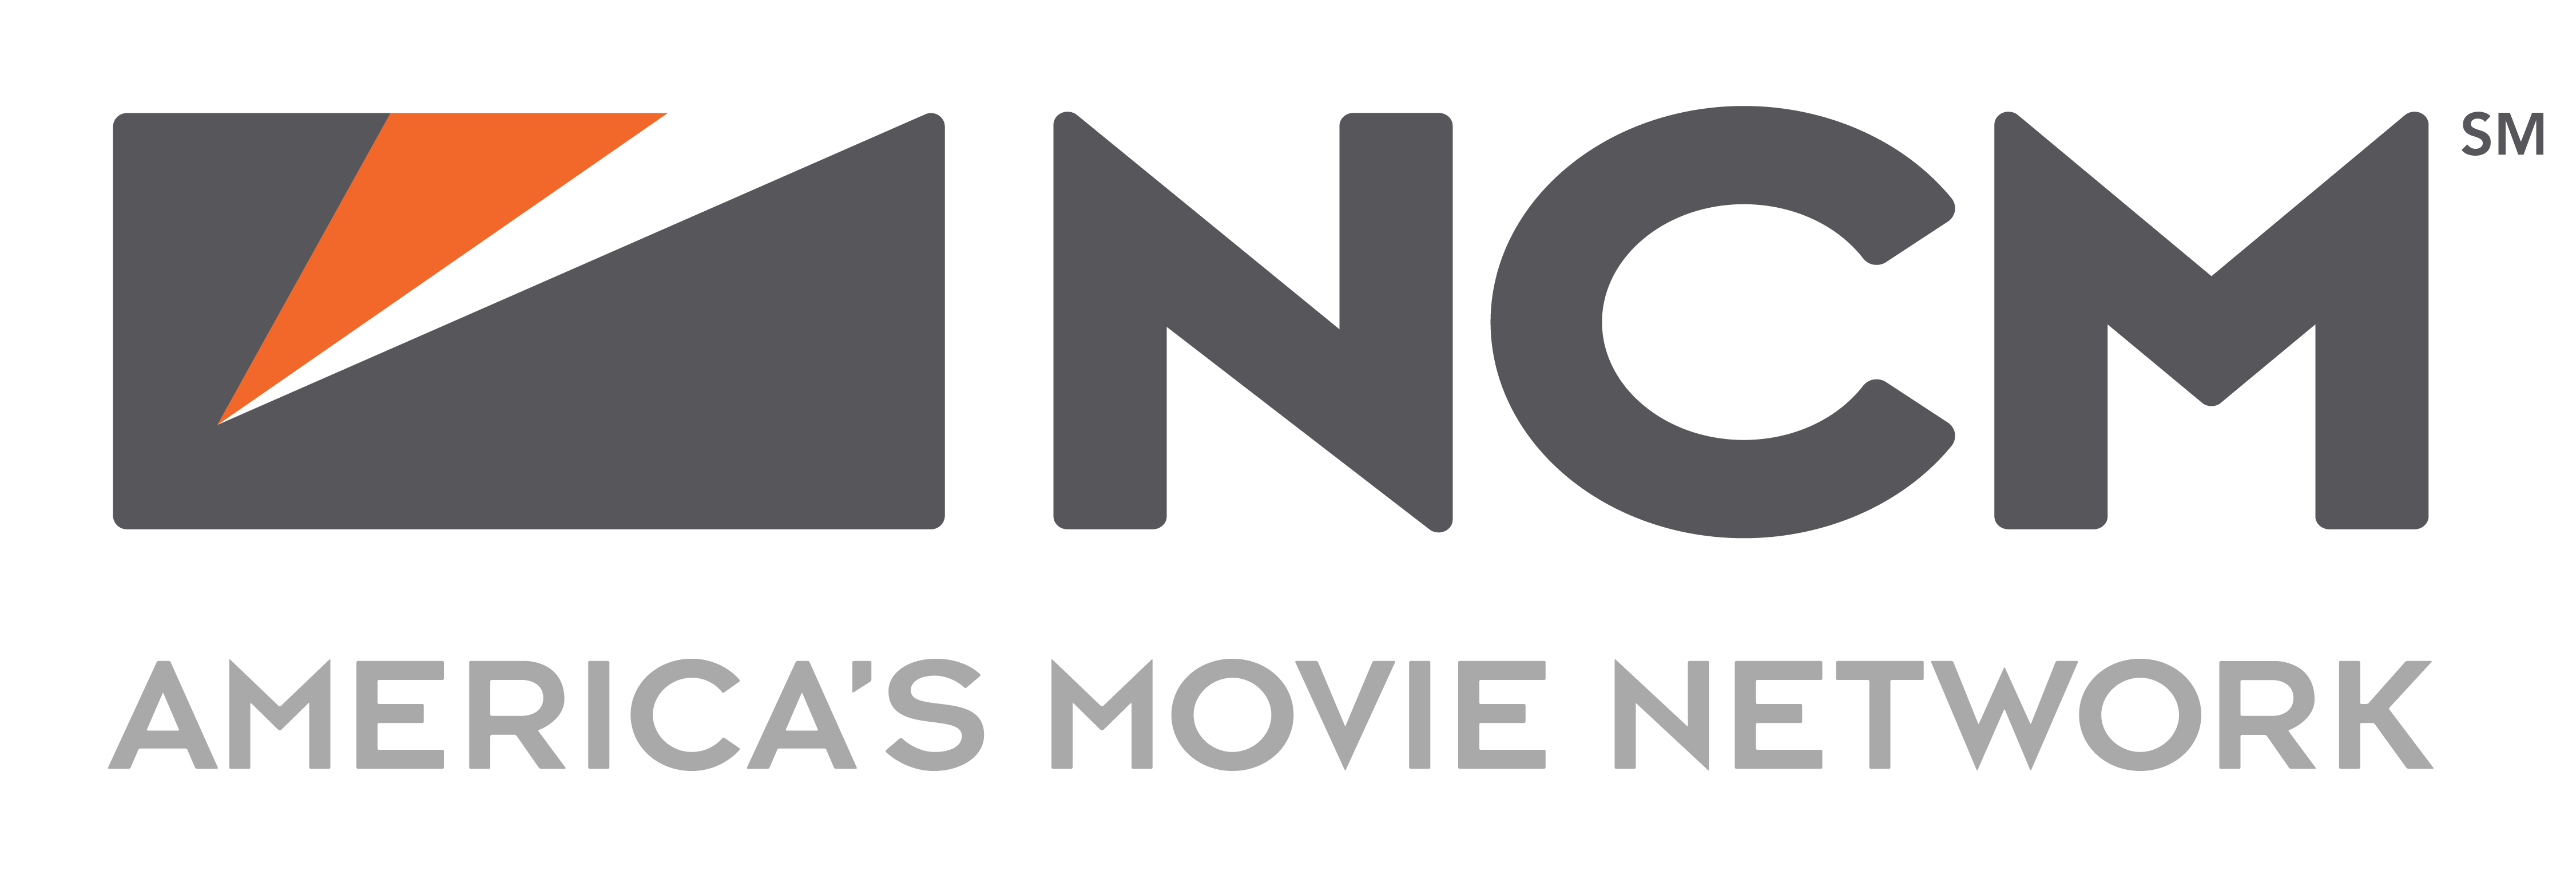 America's Movie Network- Logo